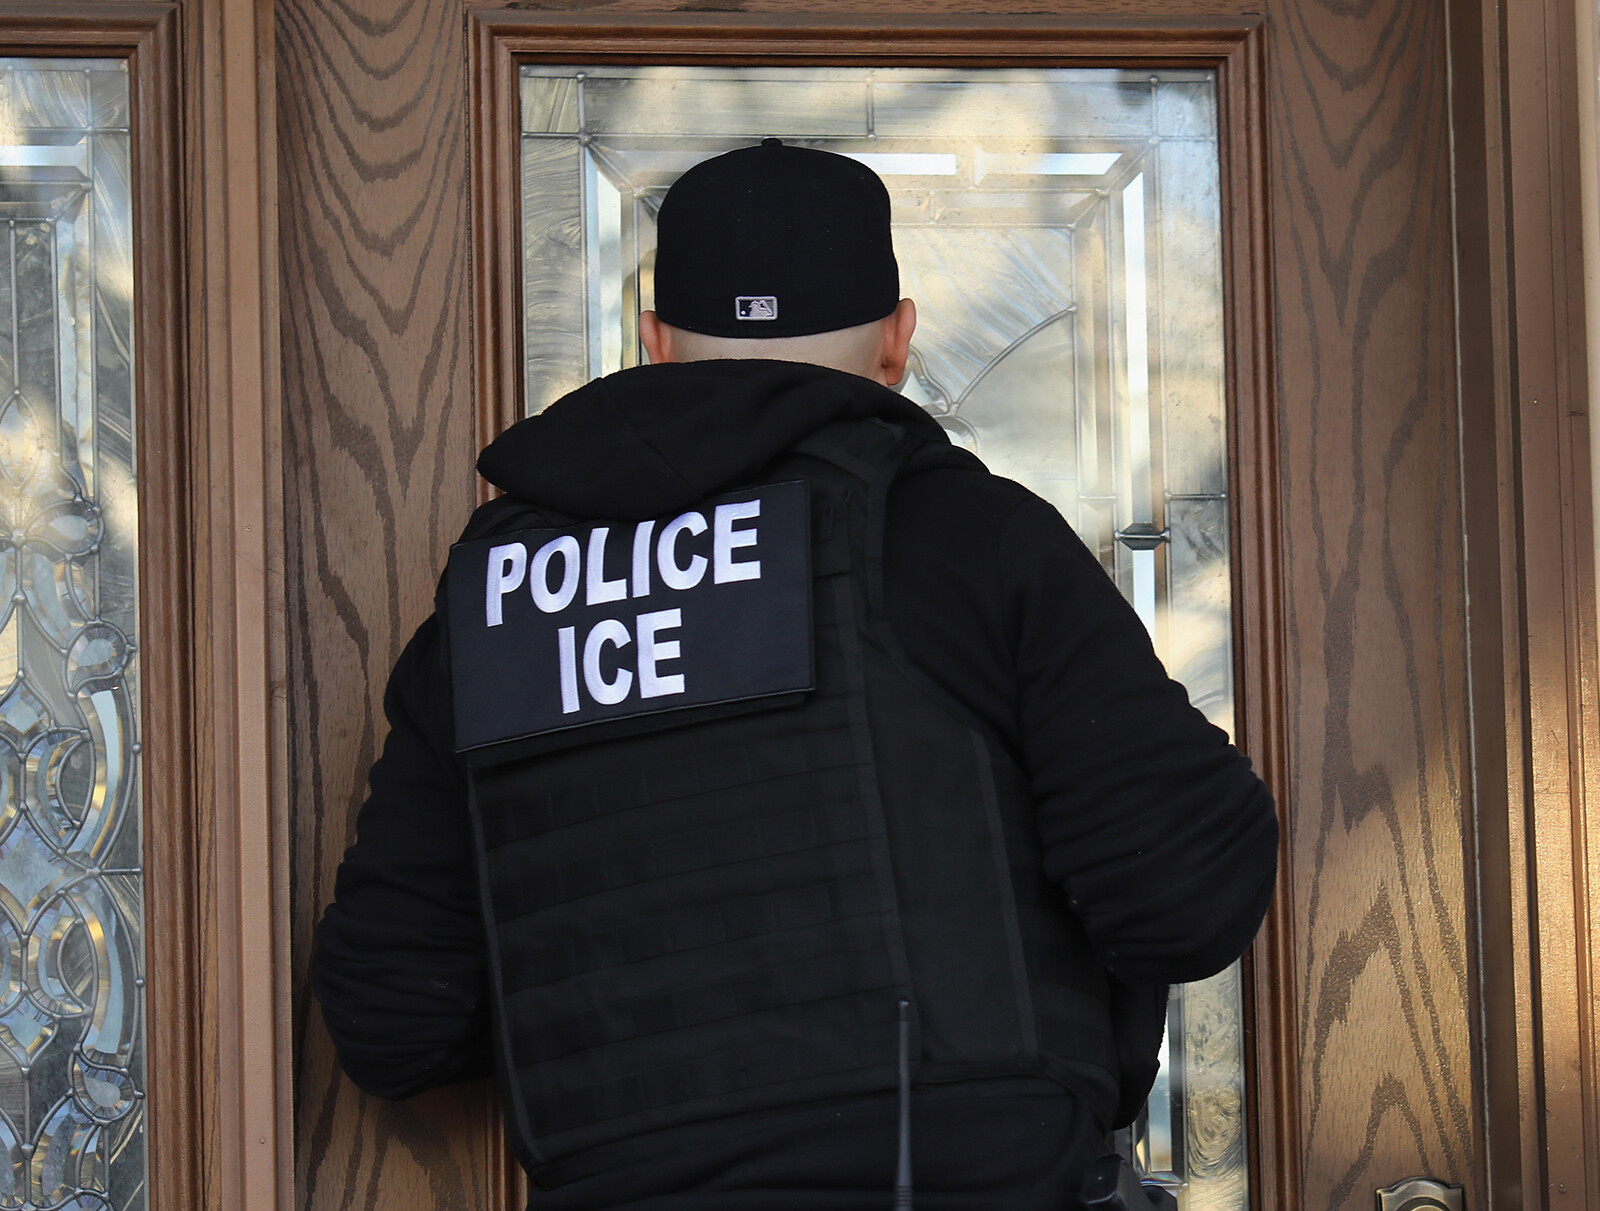 Fifth Circuit largely halts judge's order that blocks Biden's efforts to limit immigration arrests